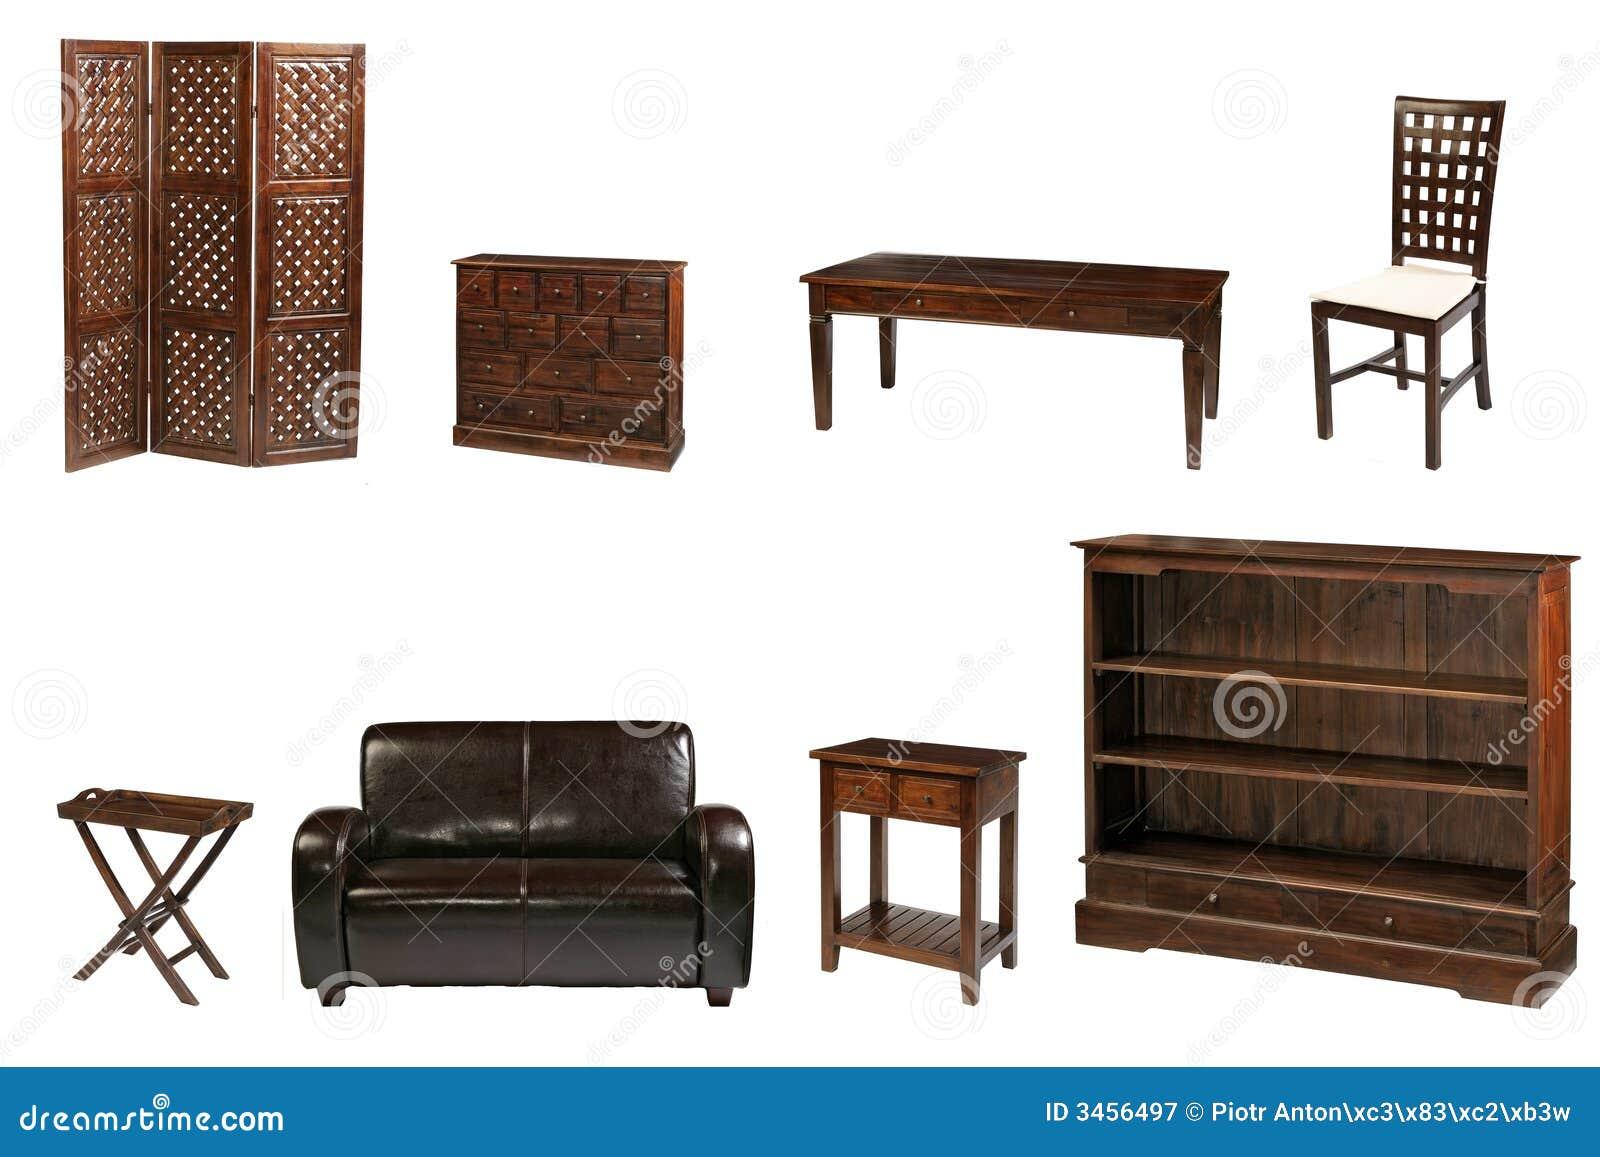 meubles coloniaux image stock image du indon sie sofa 3456497. Black Bedroom Furniture Sets. Home Design Ideas